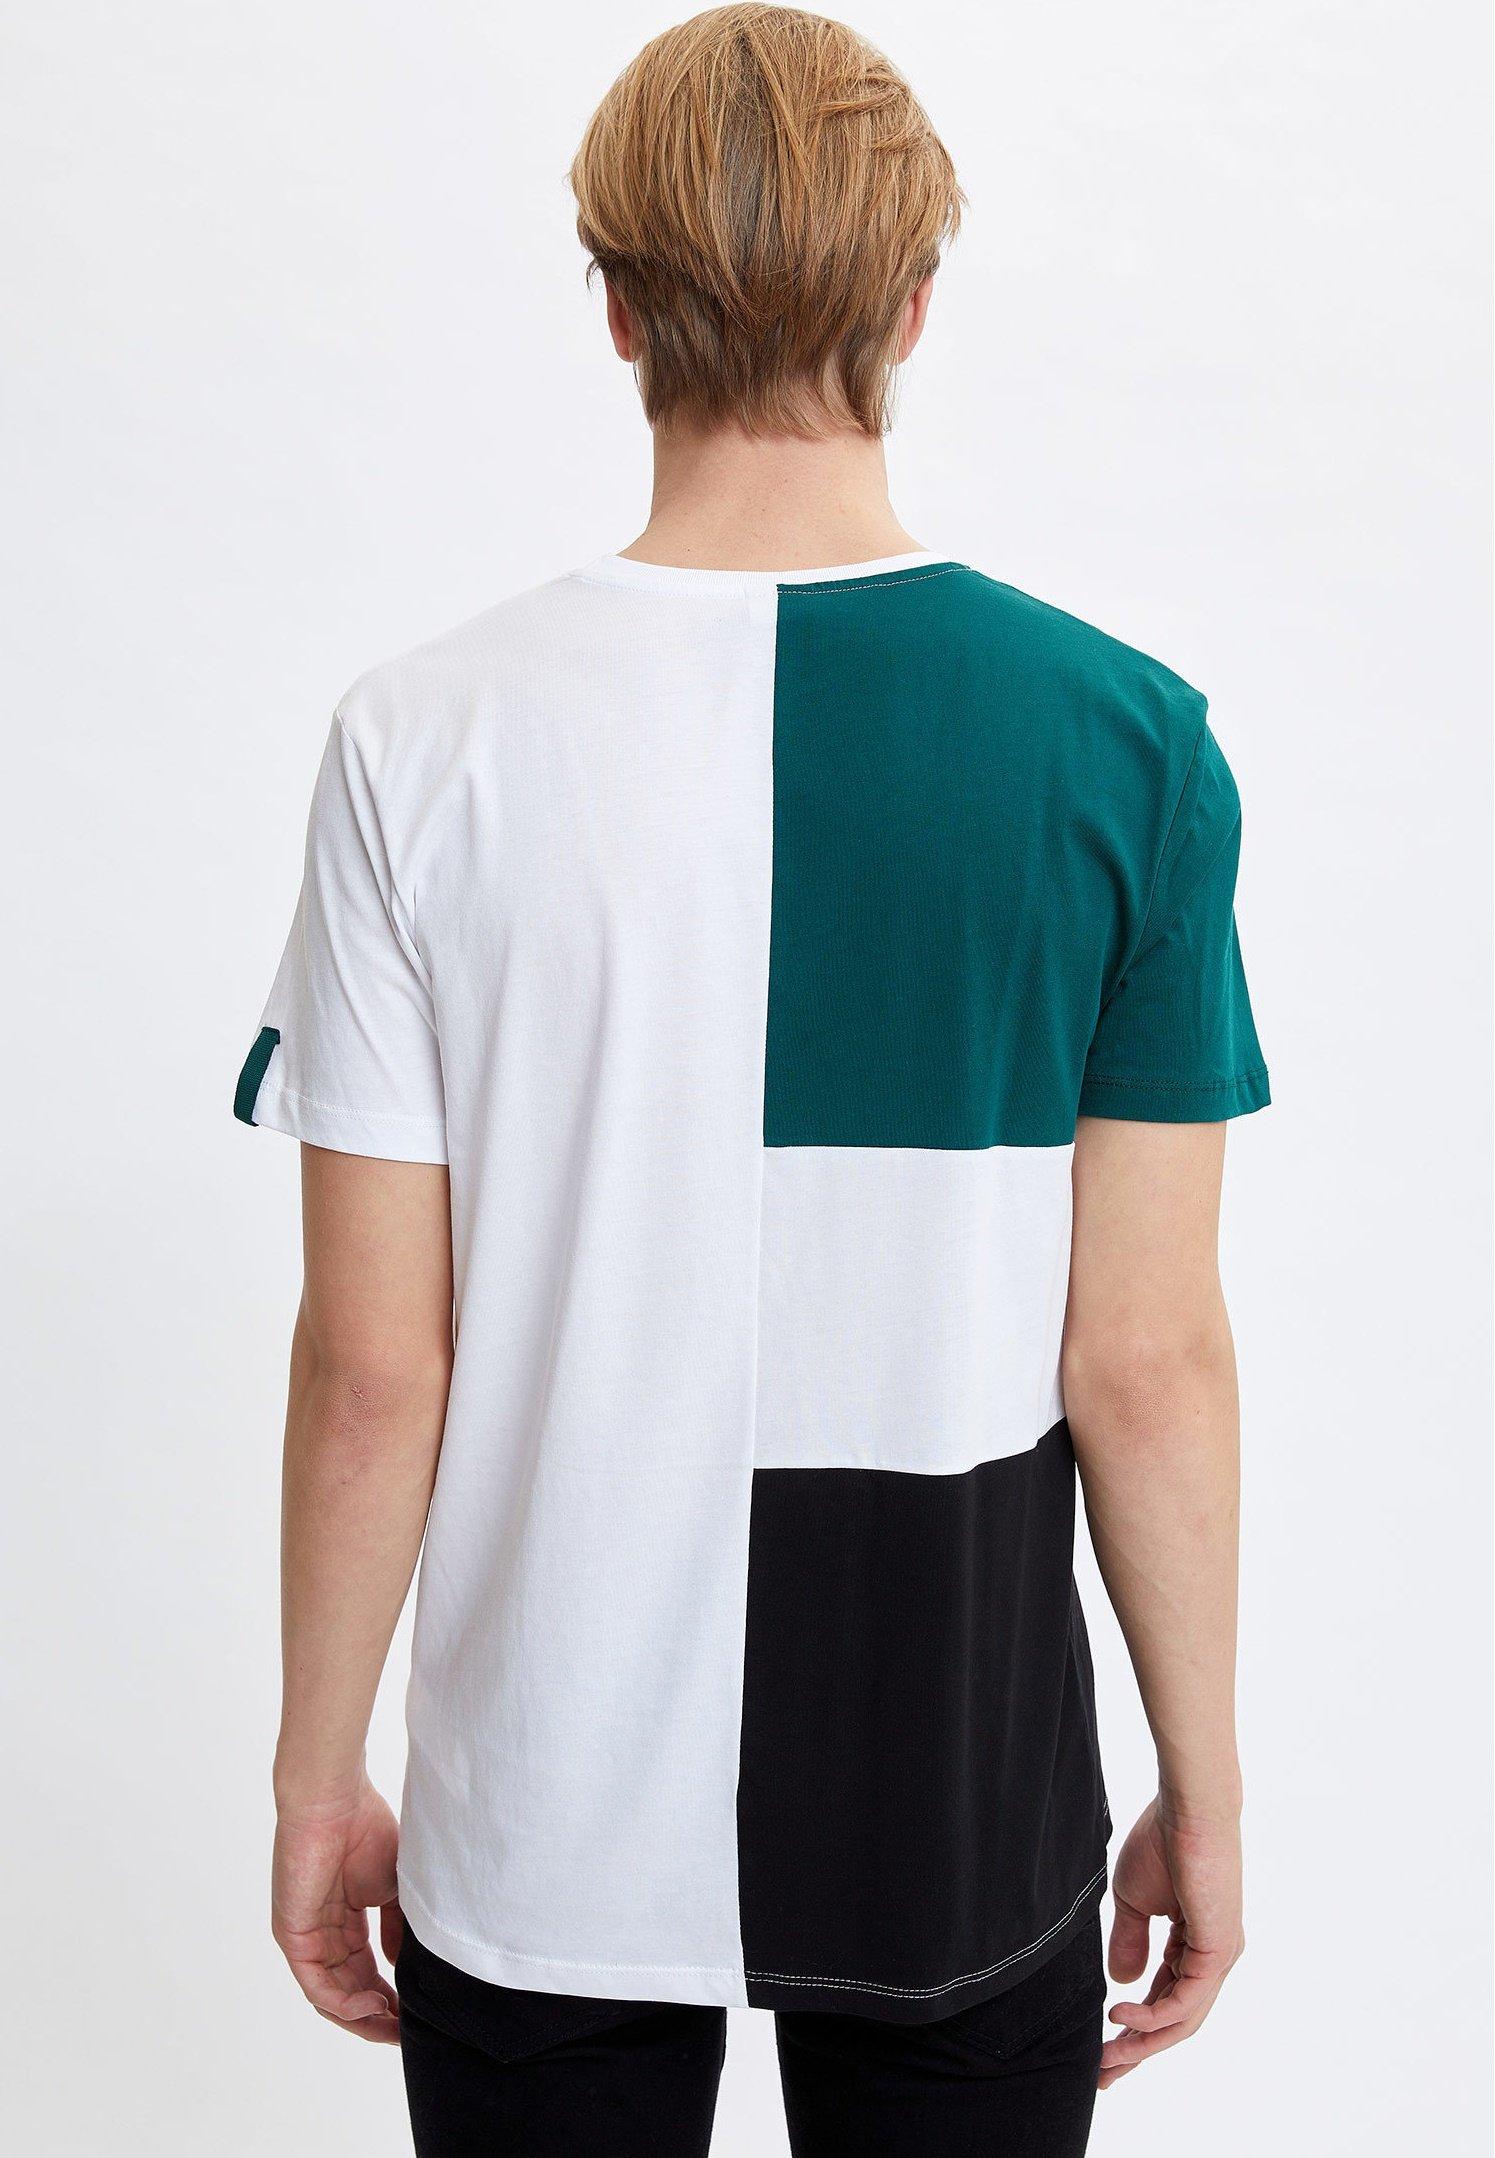 DeFacto Print T-shirt - green 97vXC